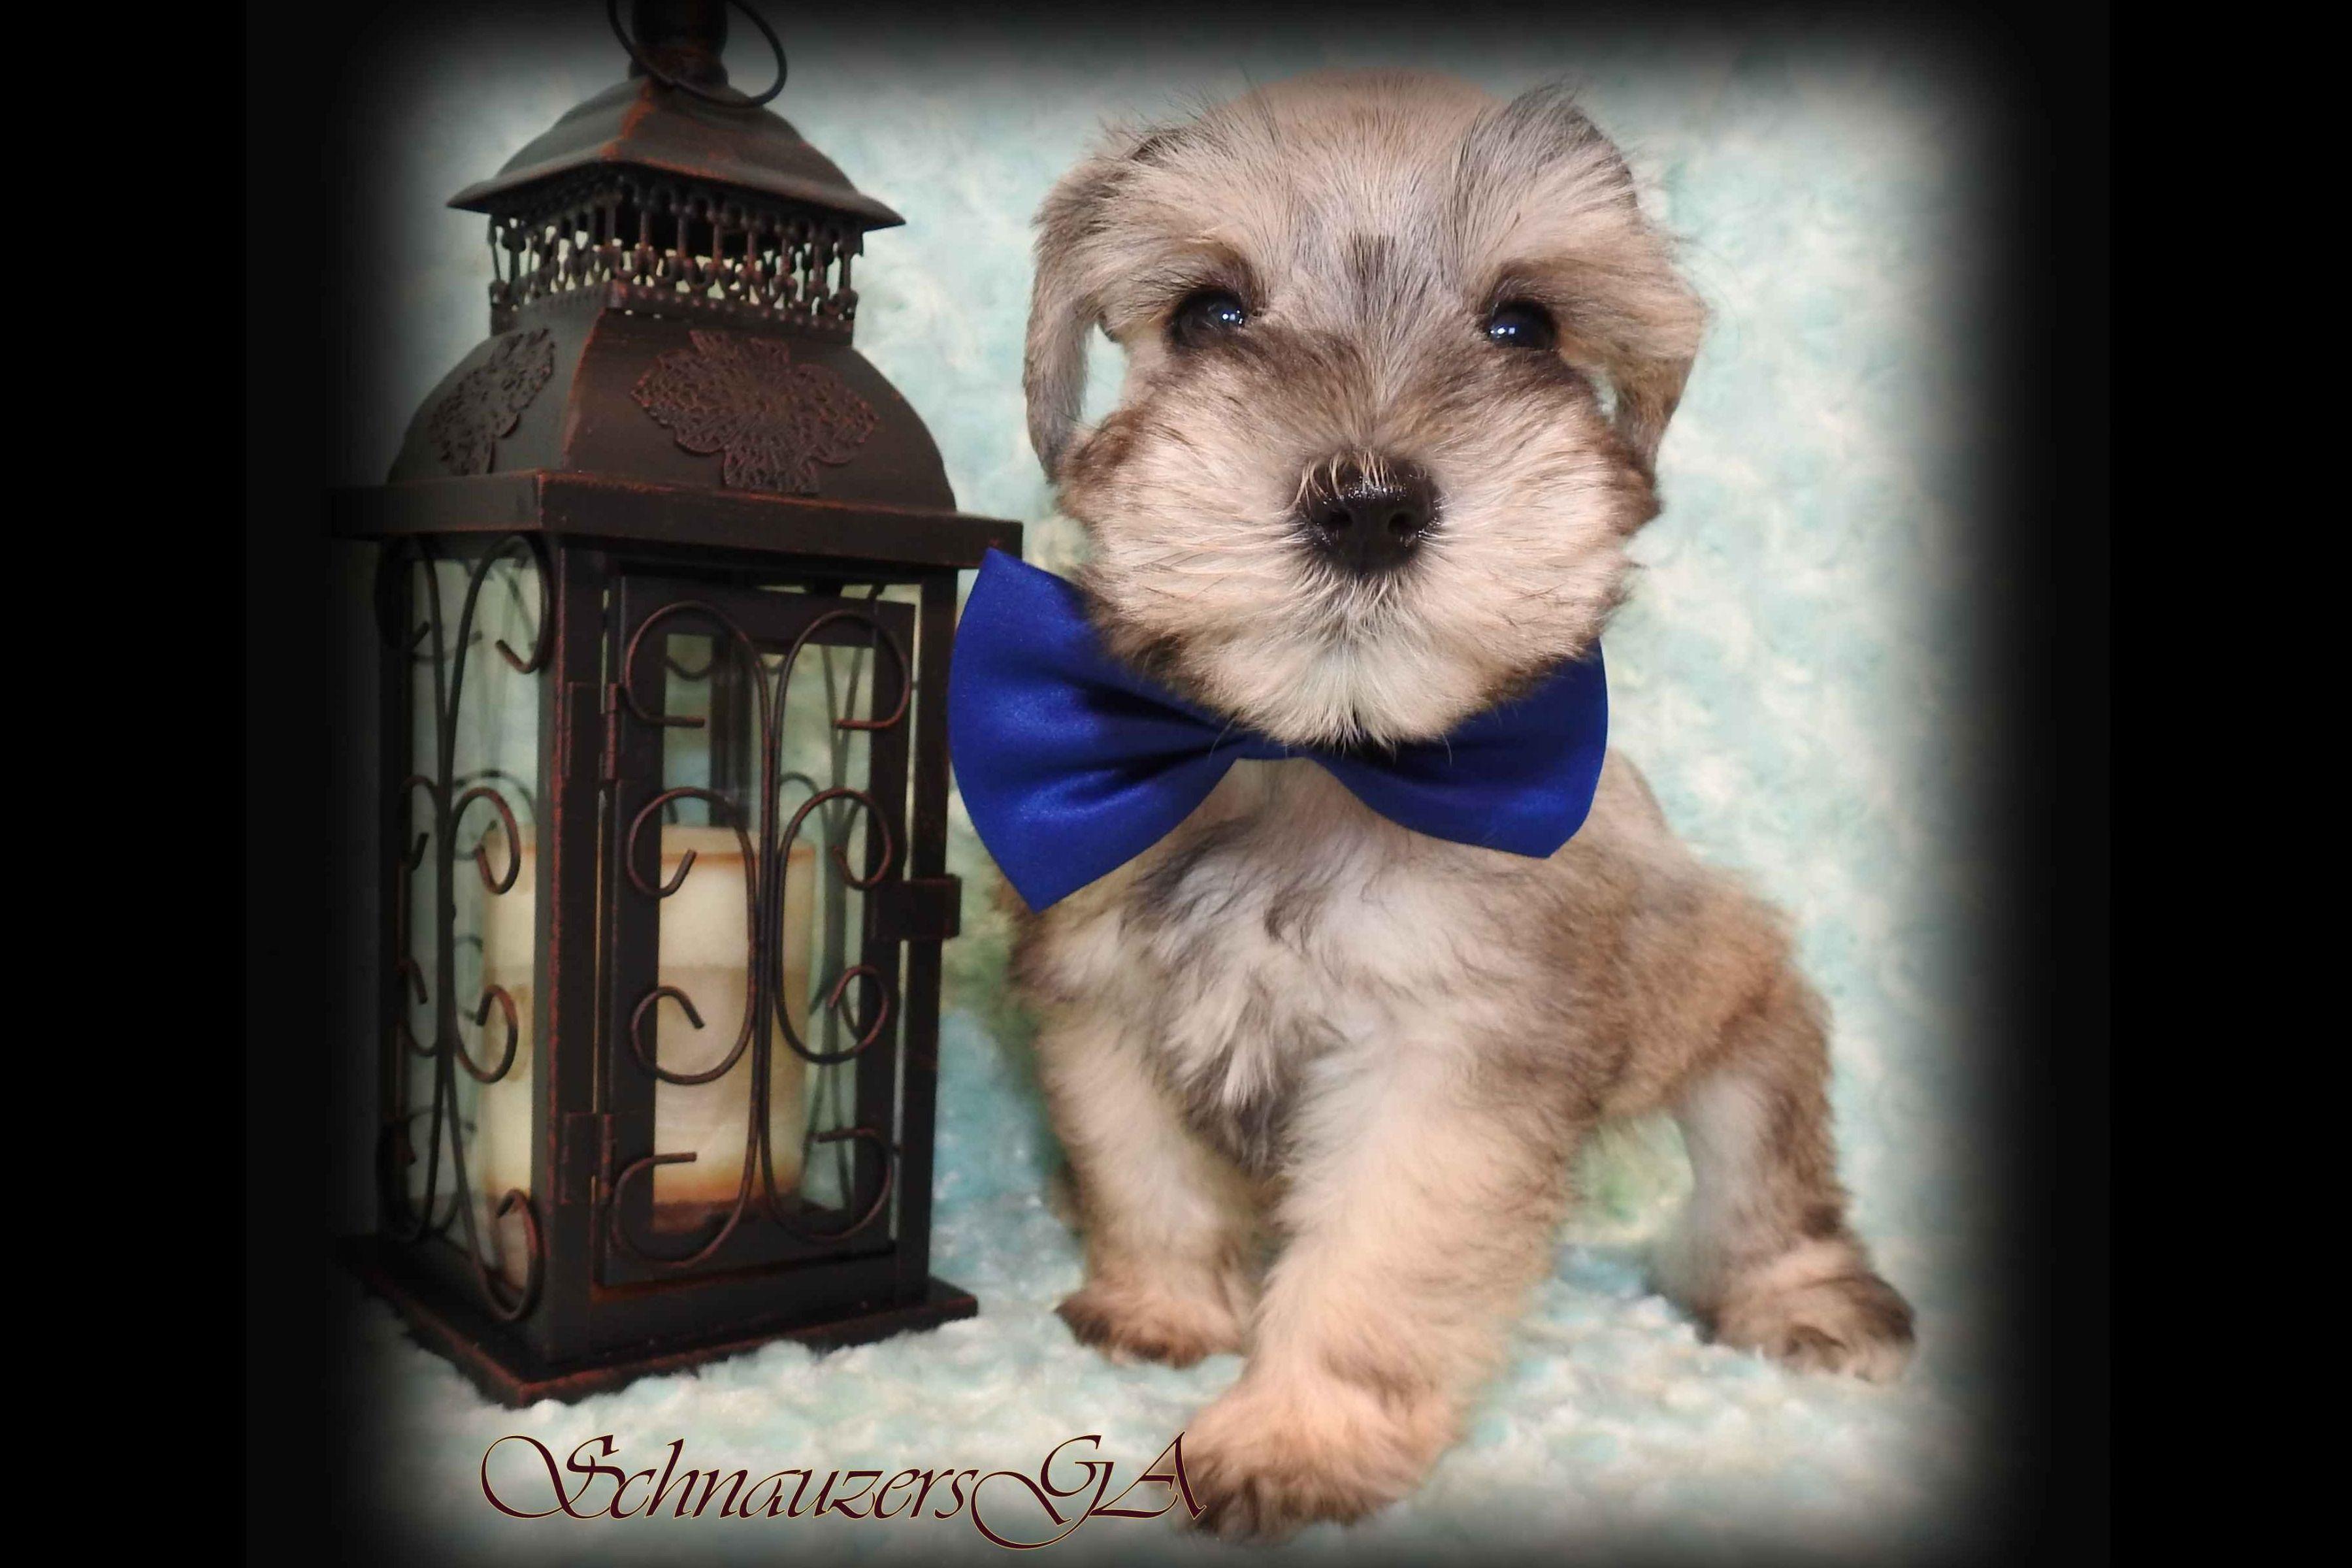 Miniature Schnauzersga Has Miniature Schnauzer Puppies For Sale In Mount Airy Ga On Akc Puppyfinder Schnauzer Puppy Puppies For Sale